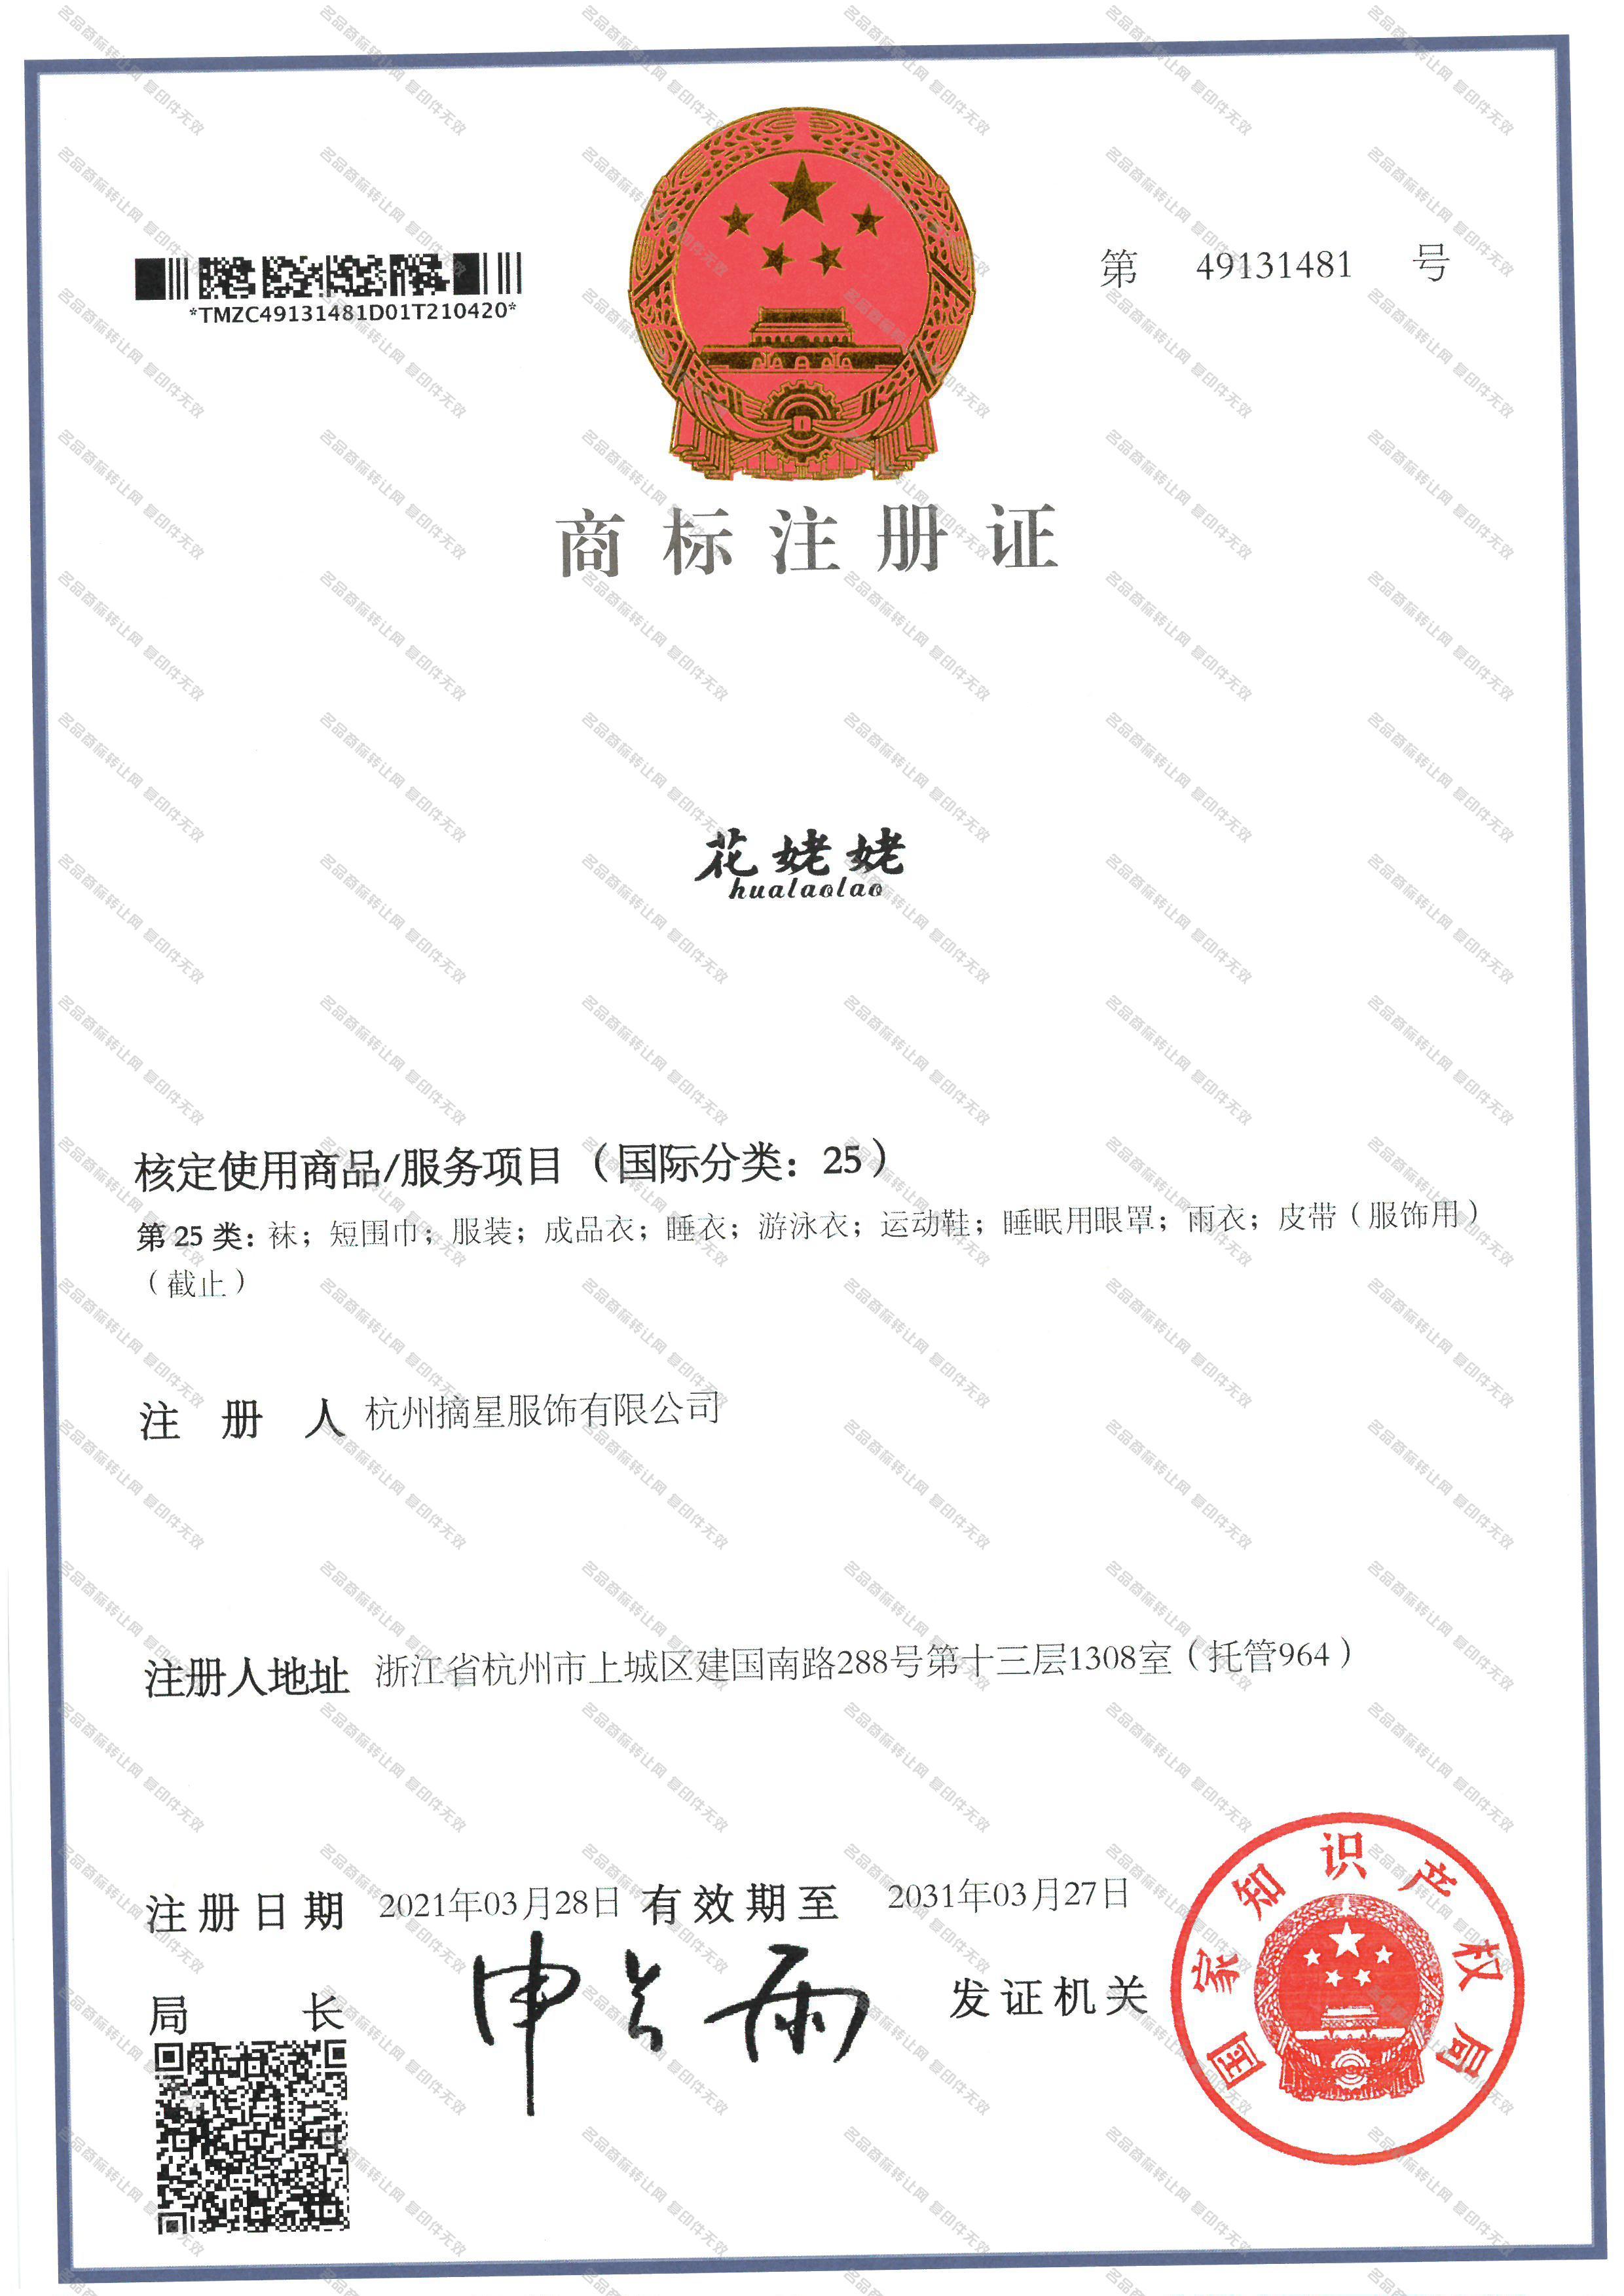 花姥姥;HUALAOLAO注册证